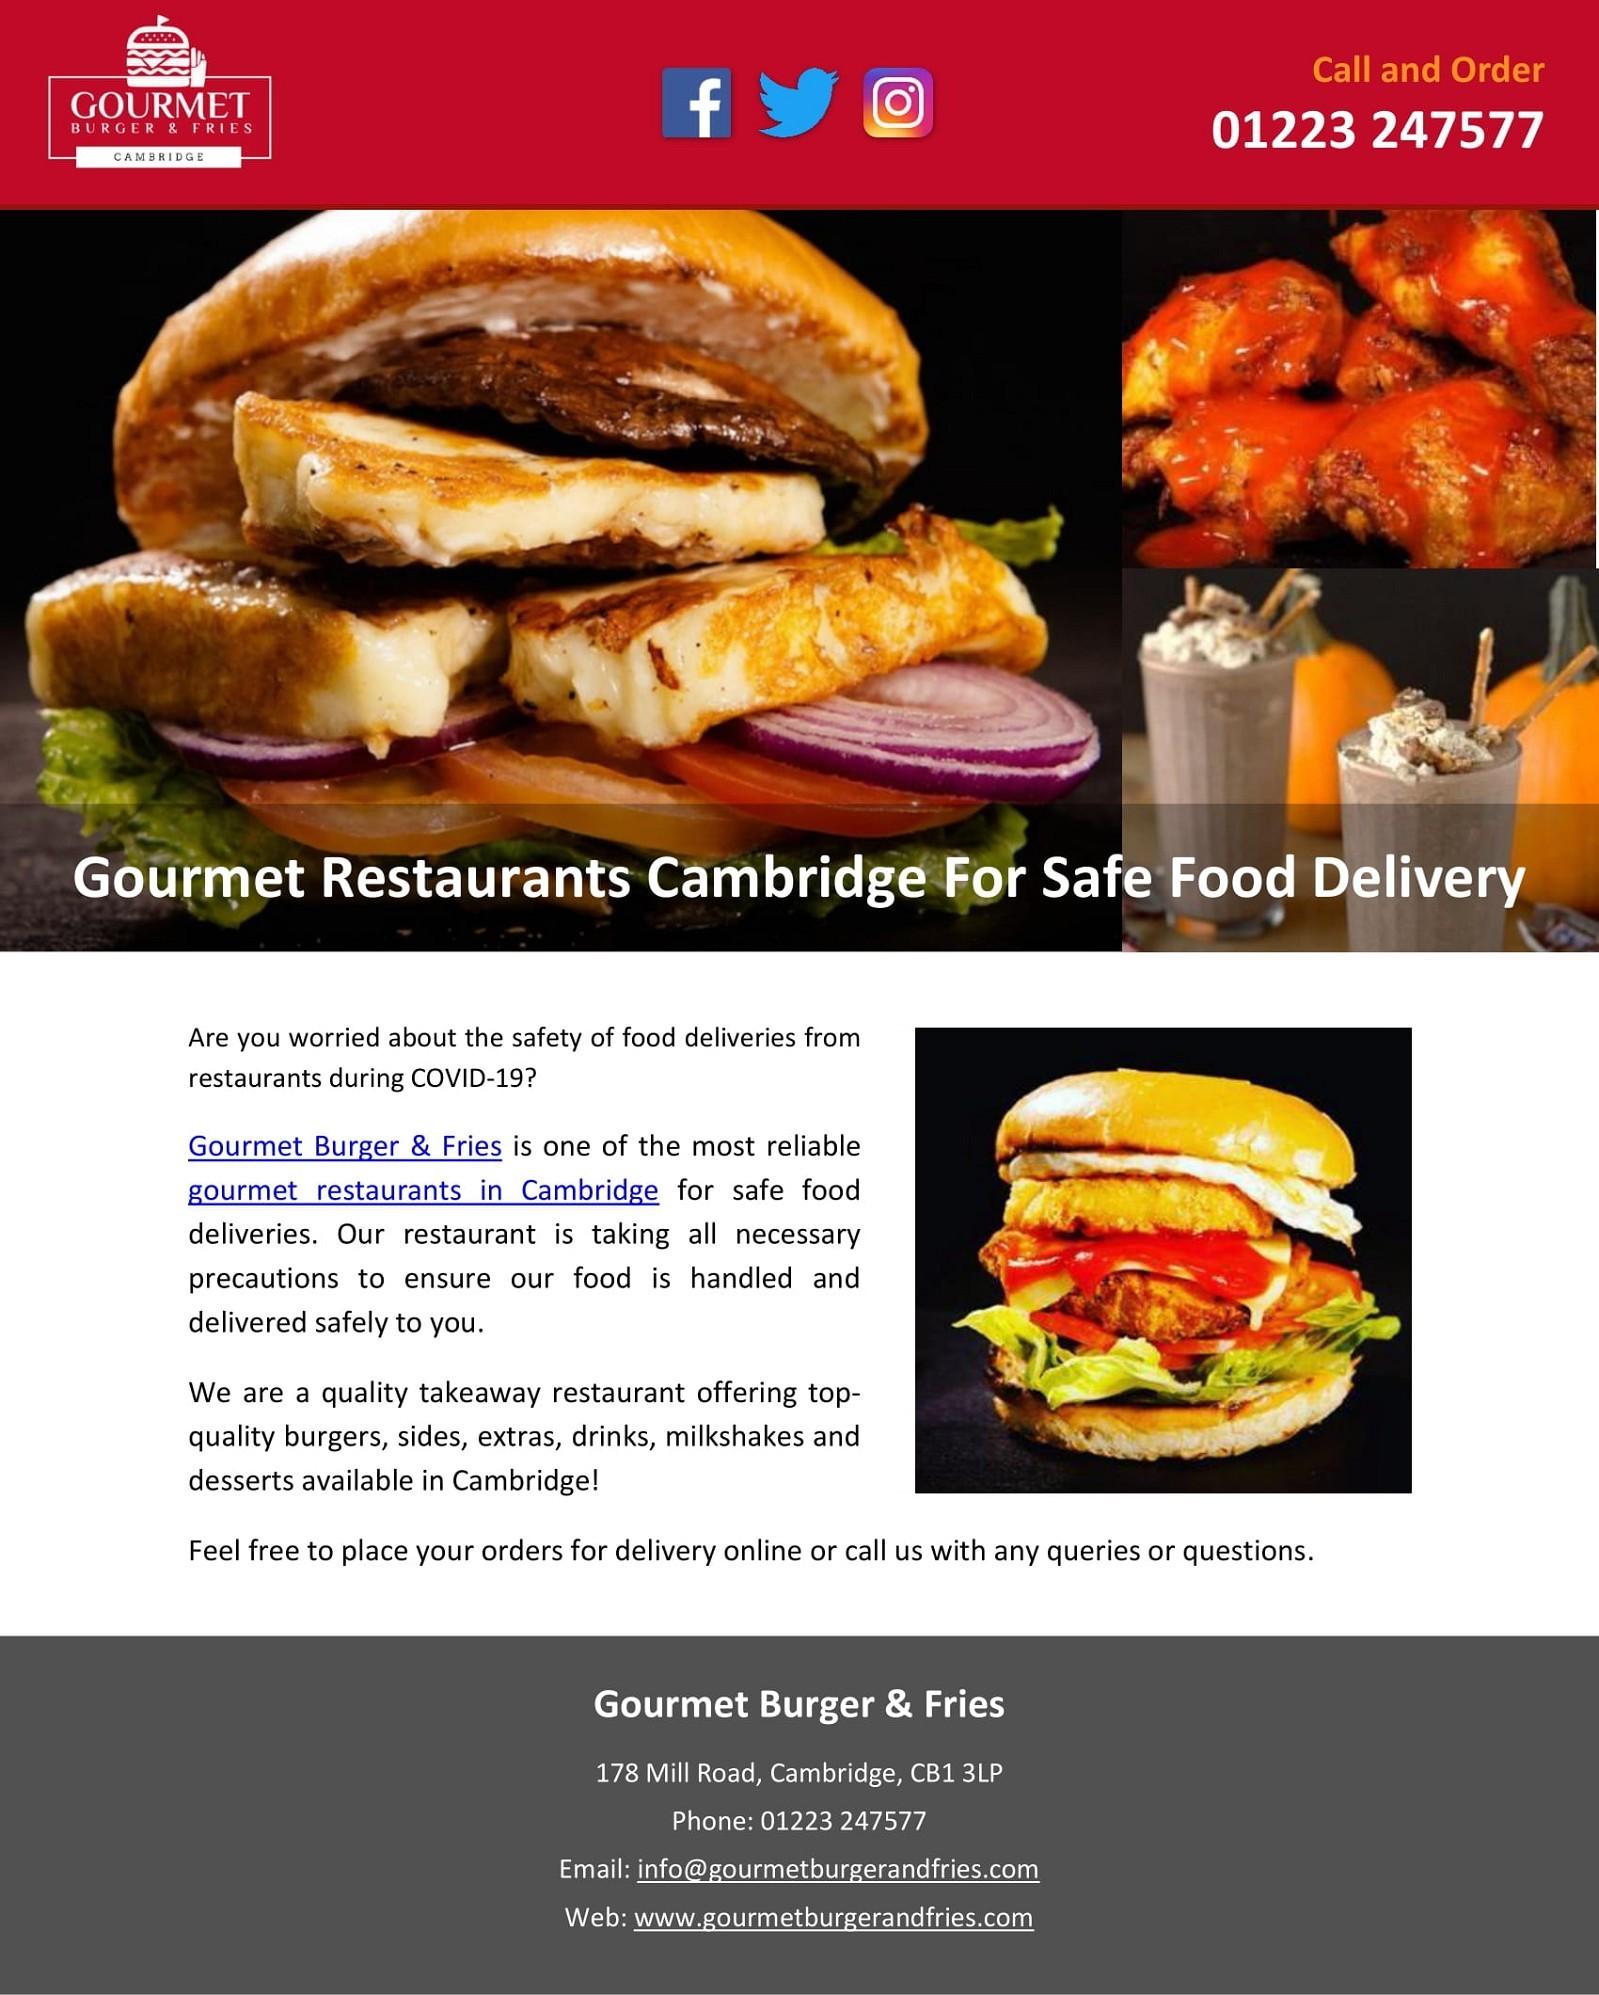 Gourmet Restaurants Cambridge For Safe Food Delivery